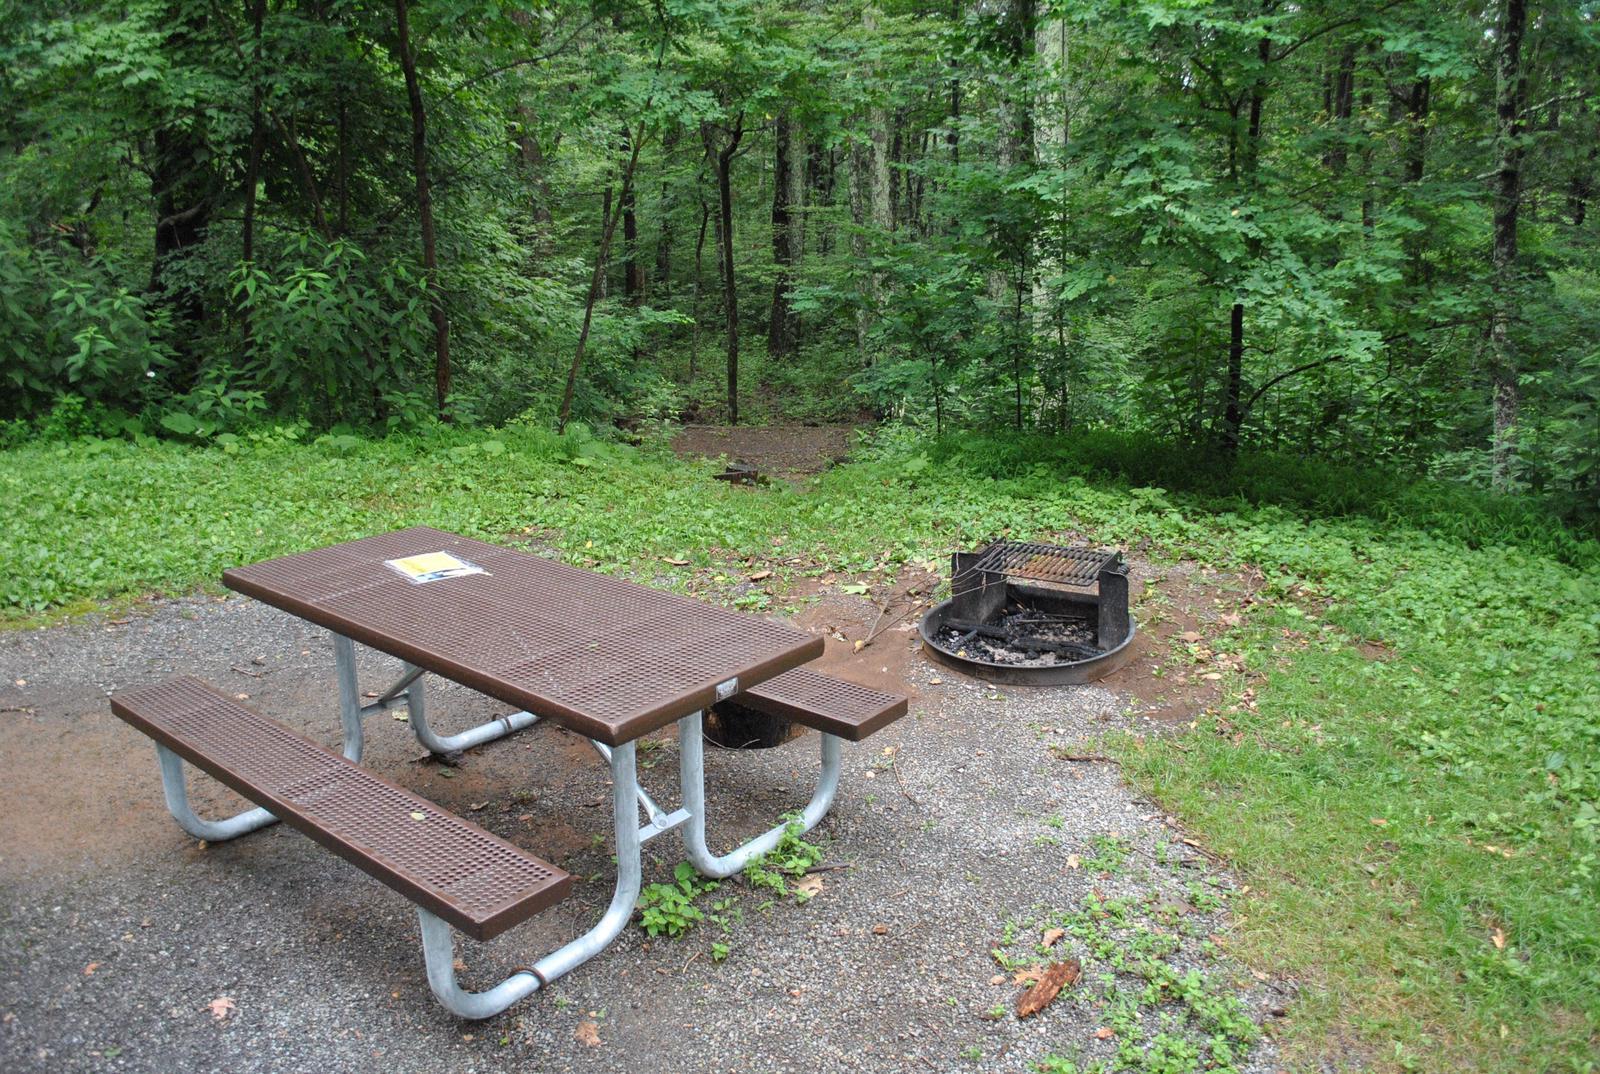 Mathews Arm Campground – Site A024